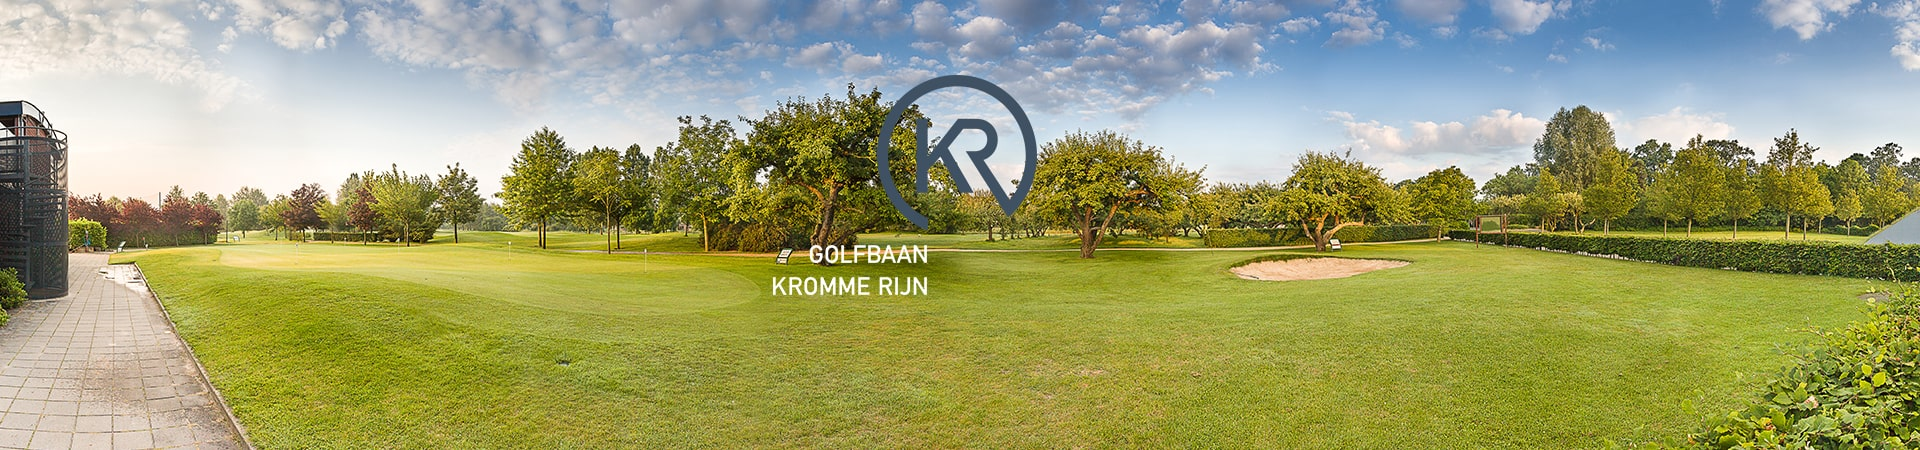 header golfbaan logo 01